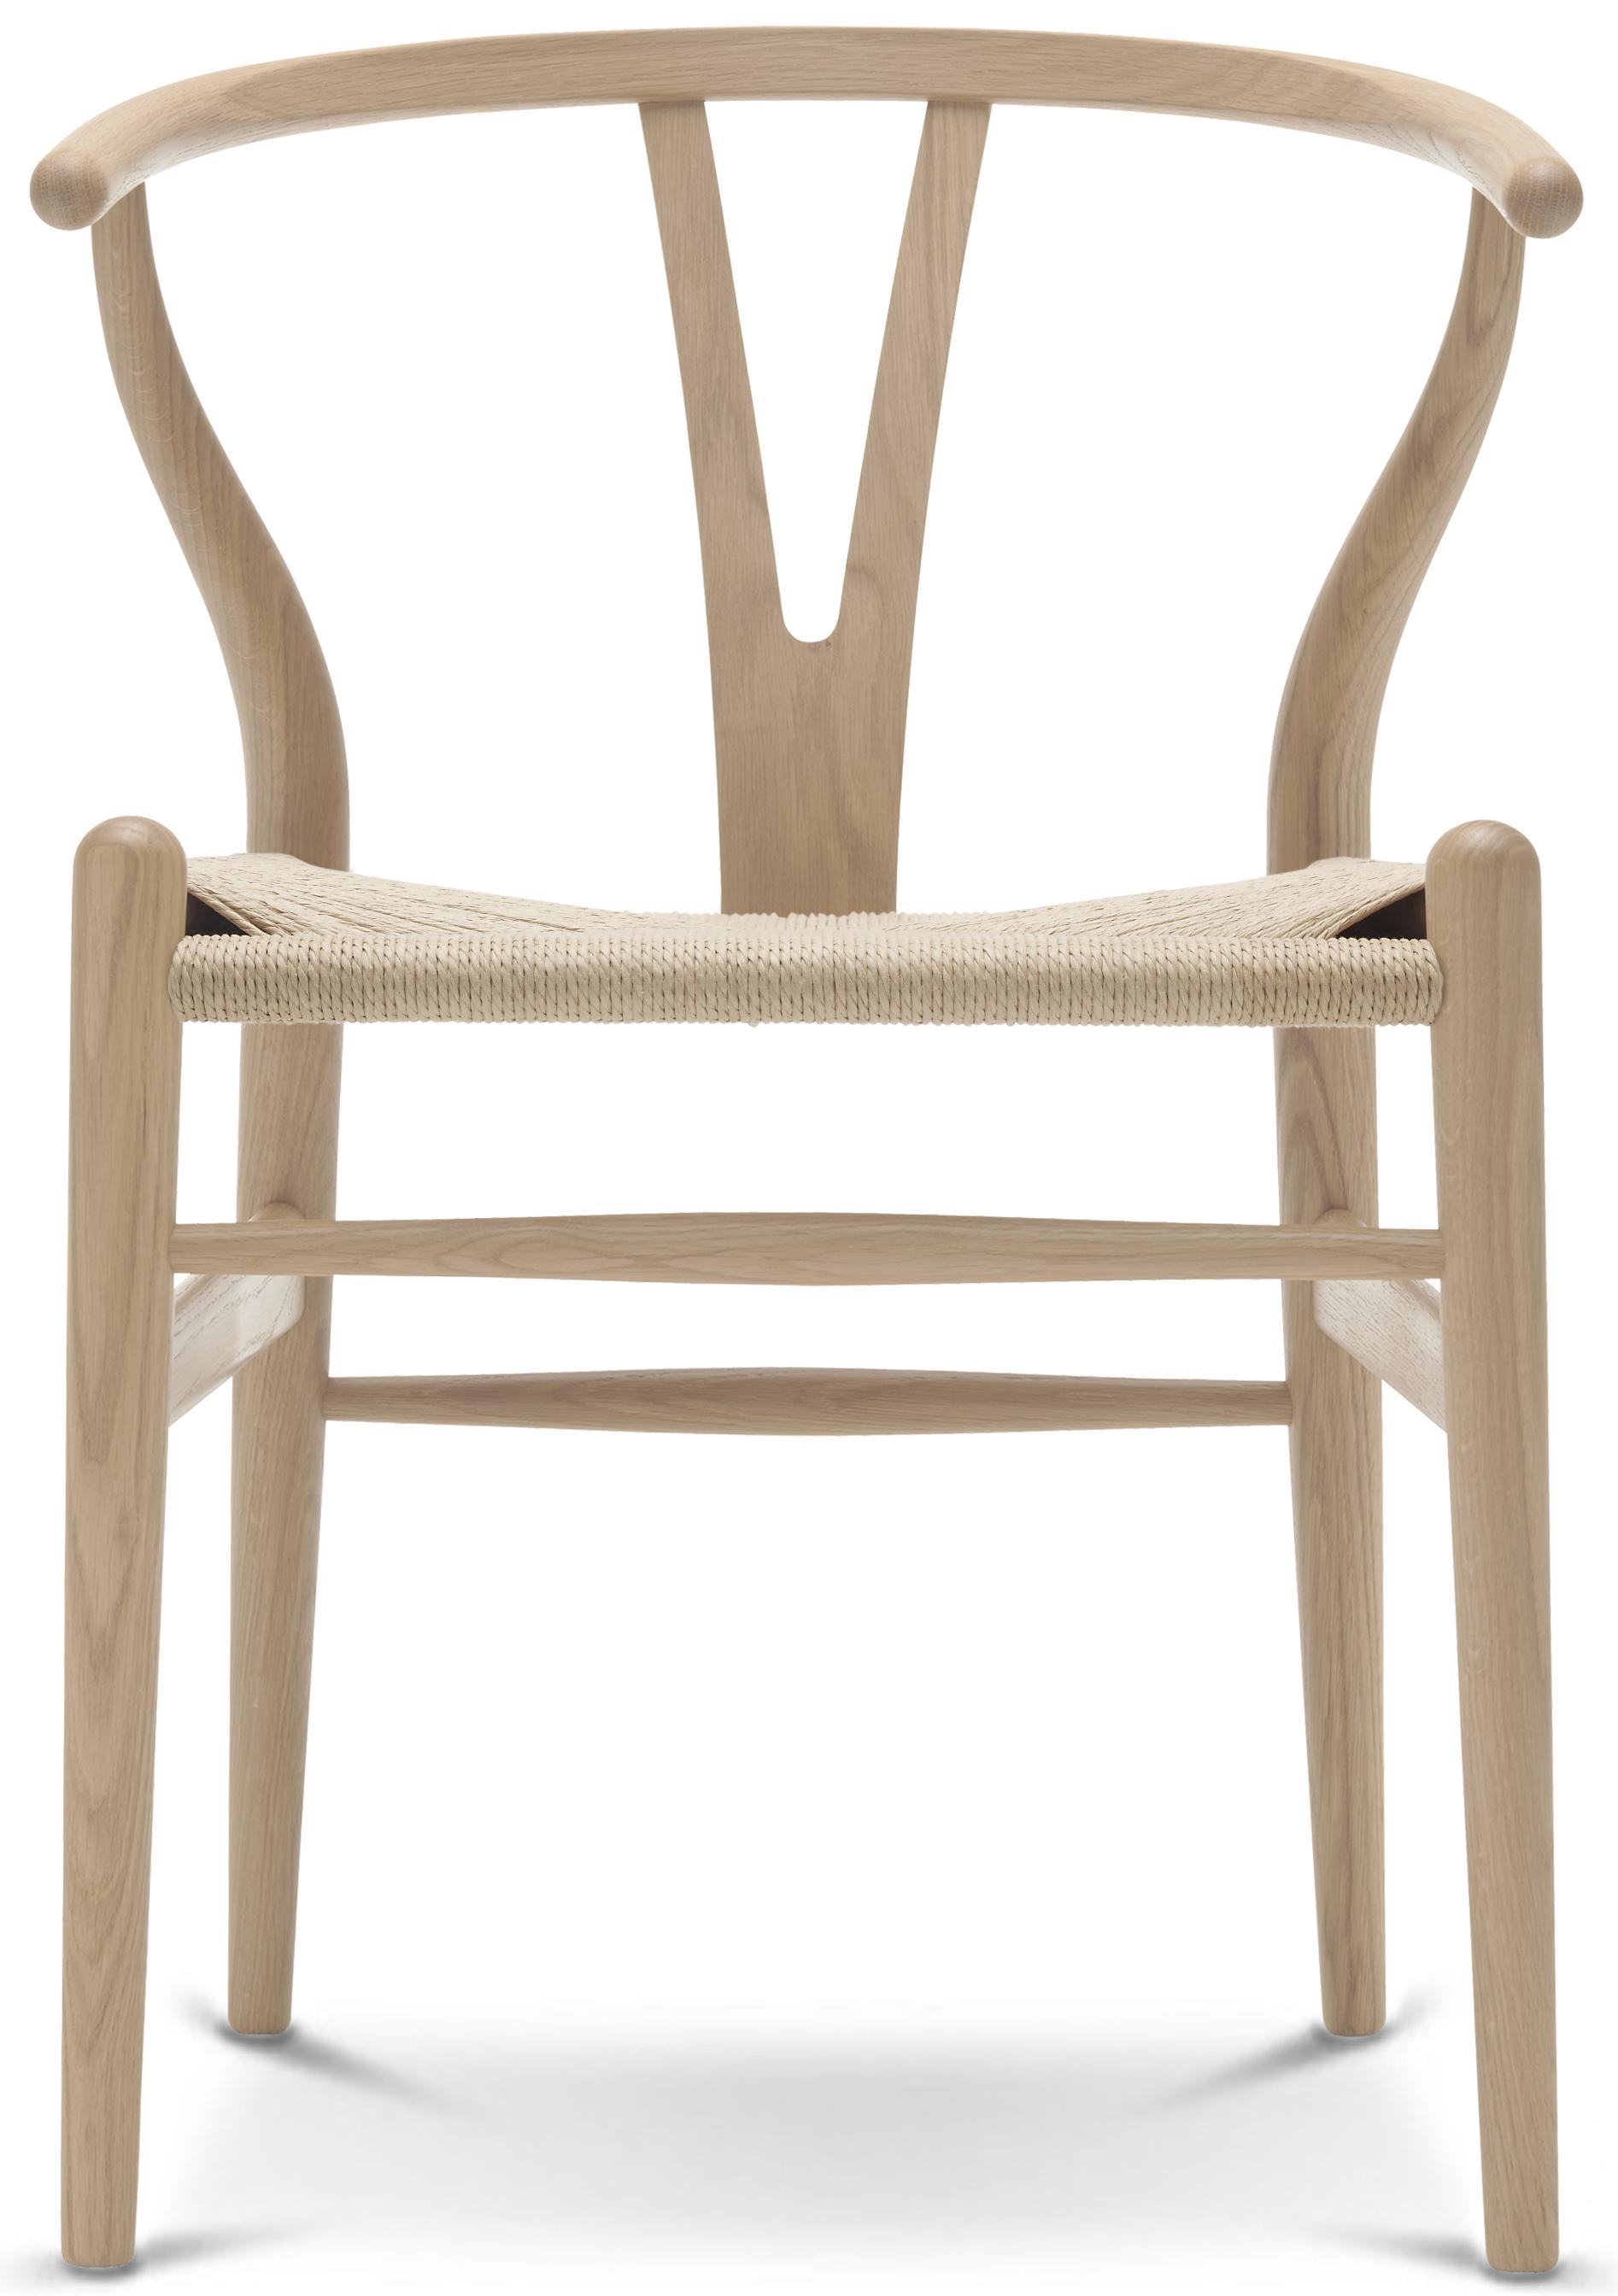 Carl Hansen Søn Wishbone Chair Ch24 Hans J Wegner